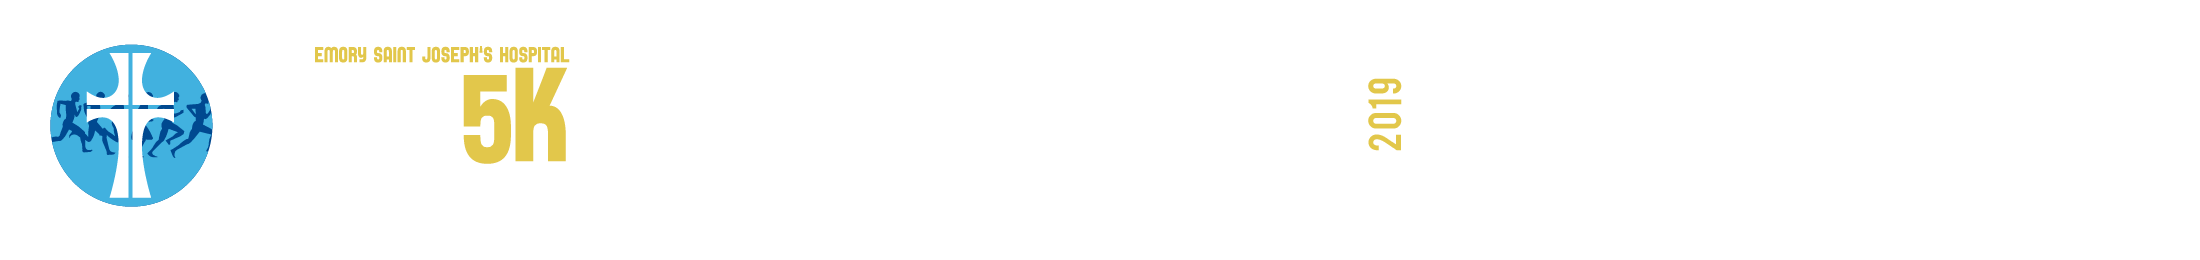 Emory Saint Joseph's Hospital Run for Mercy 5K